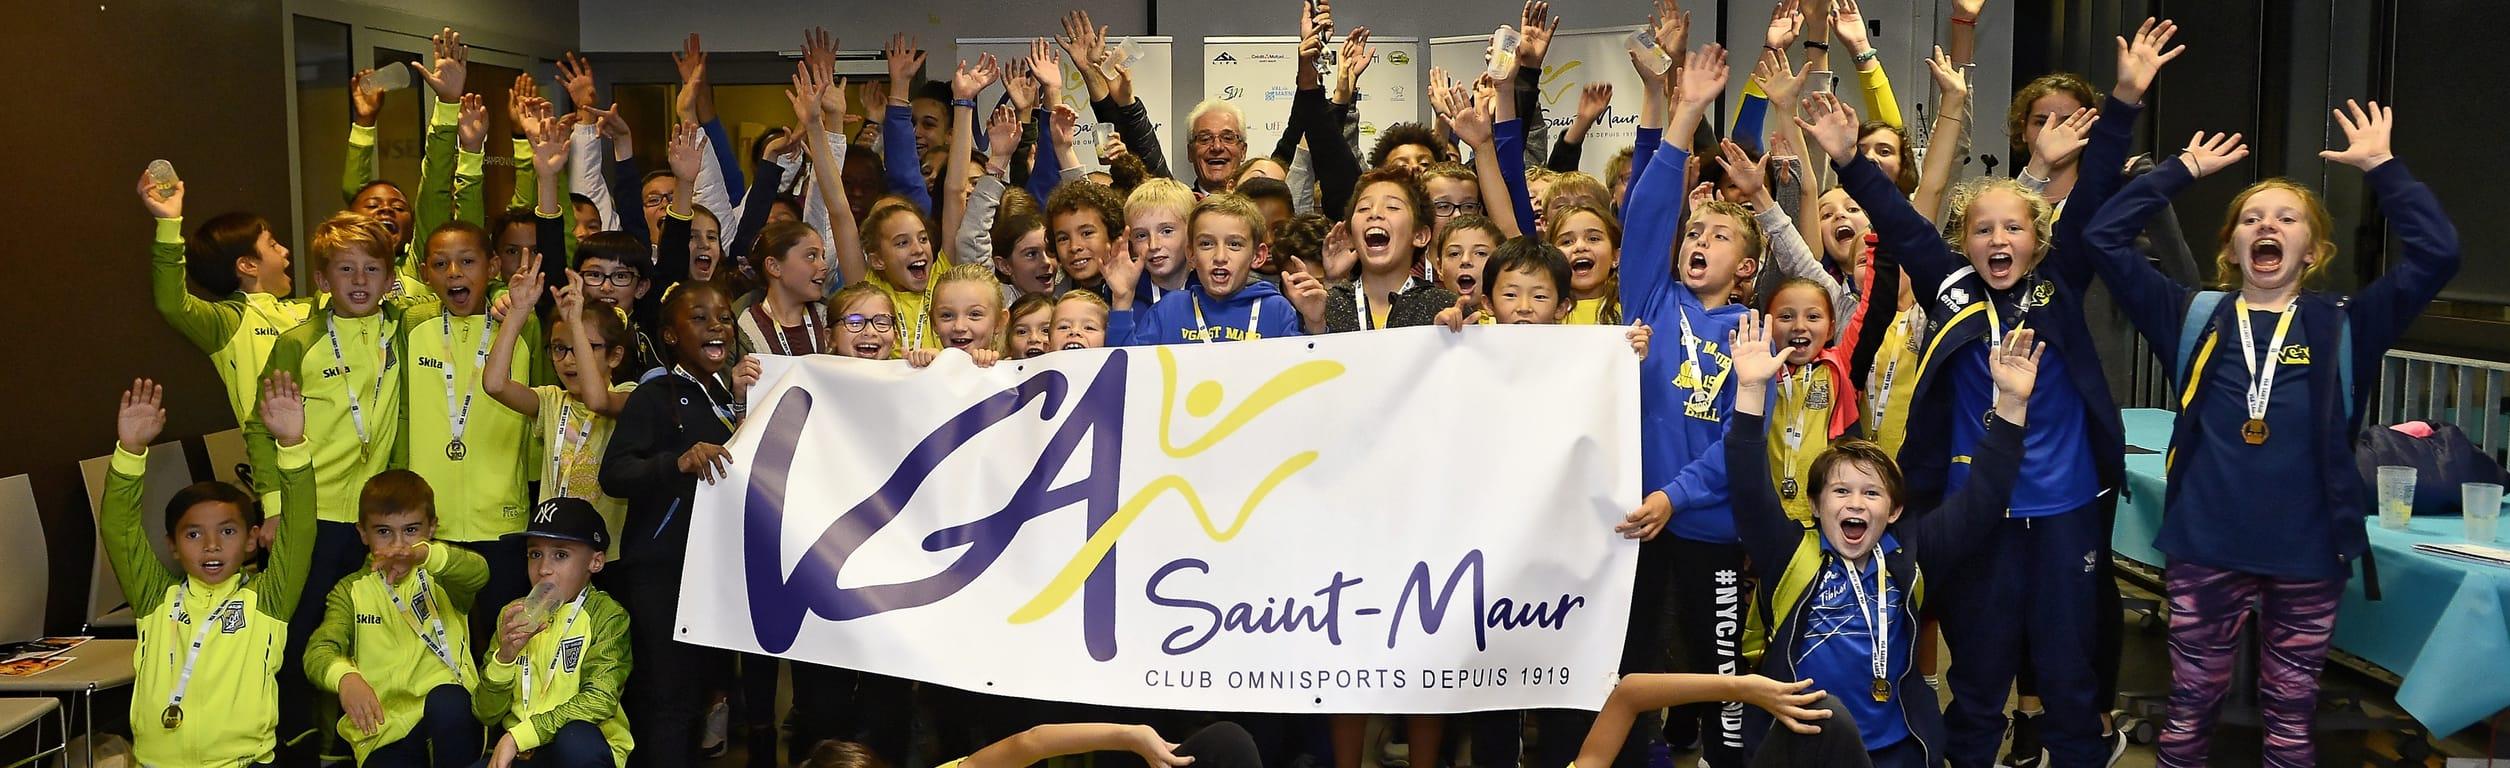 VGA Saint-Maur Omnisports